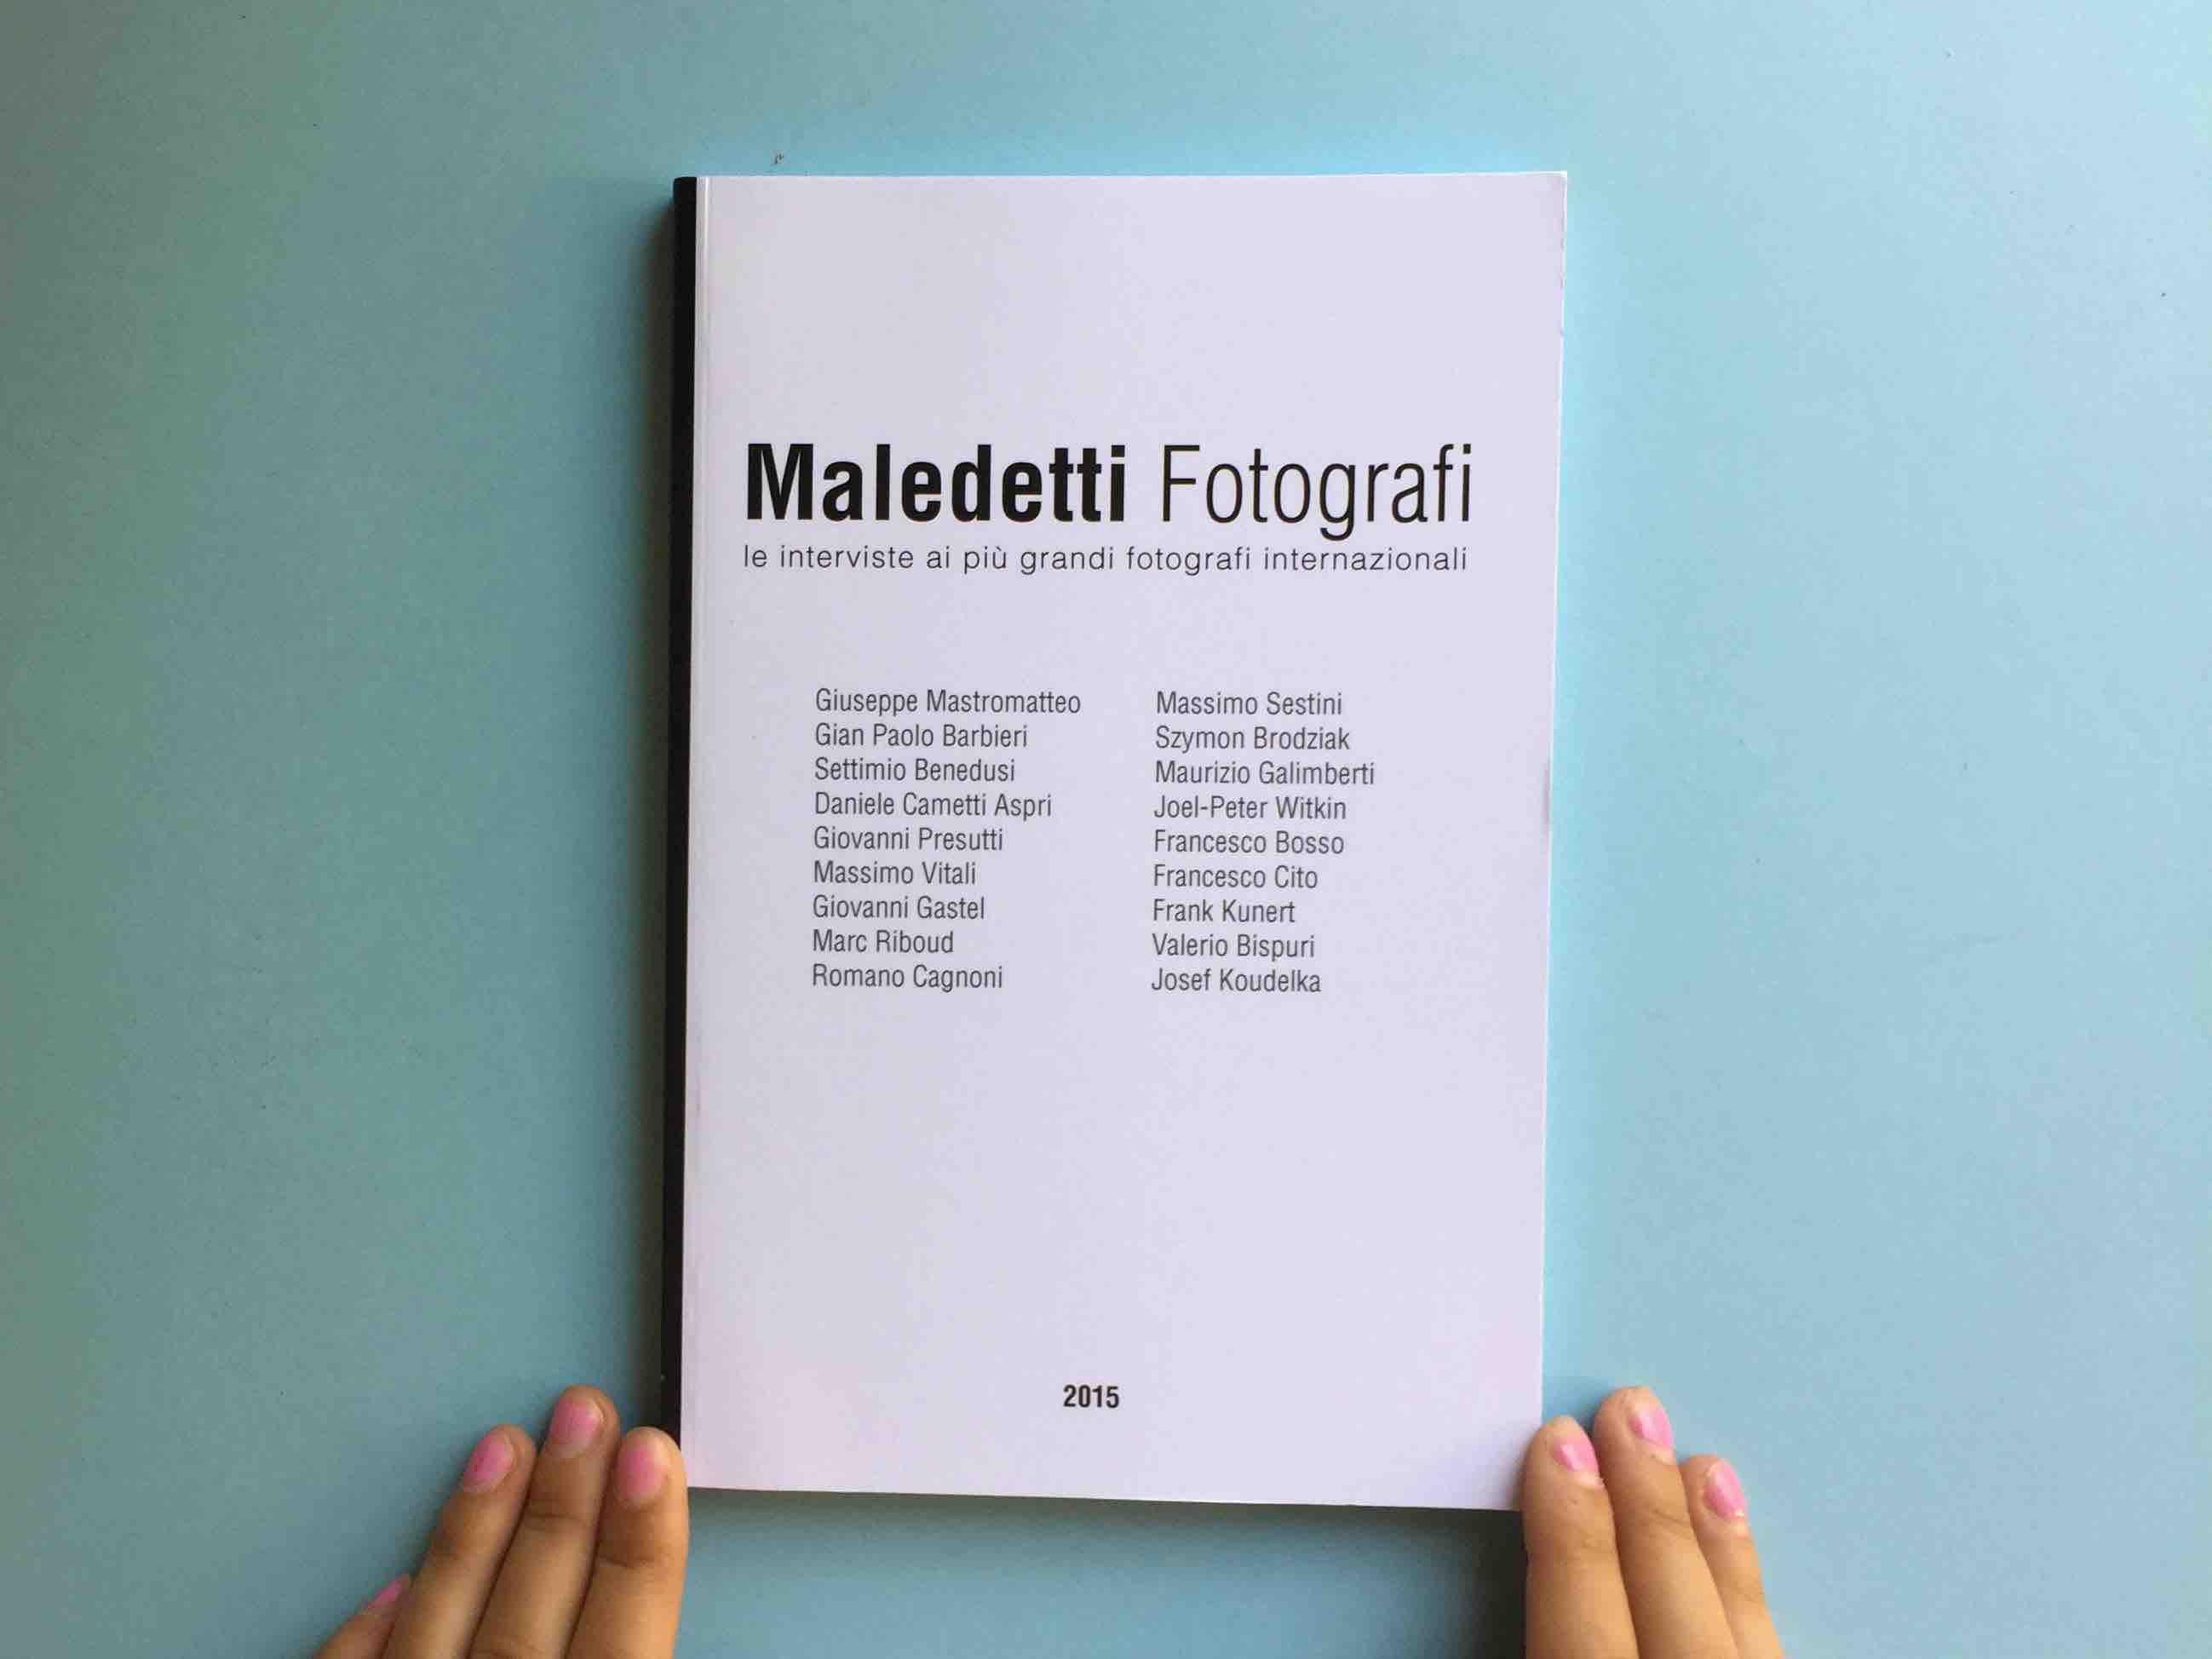 MALEDETTI FOTOGRAFI / 2015